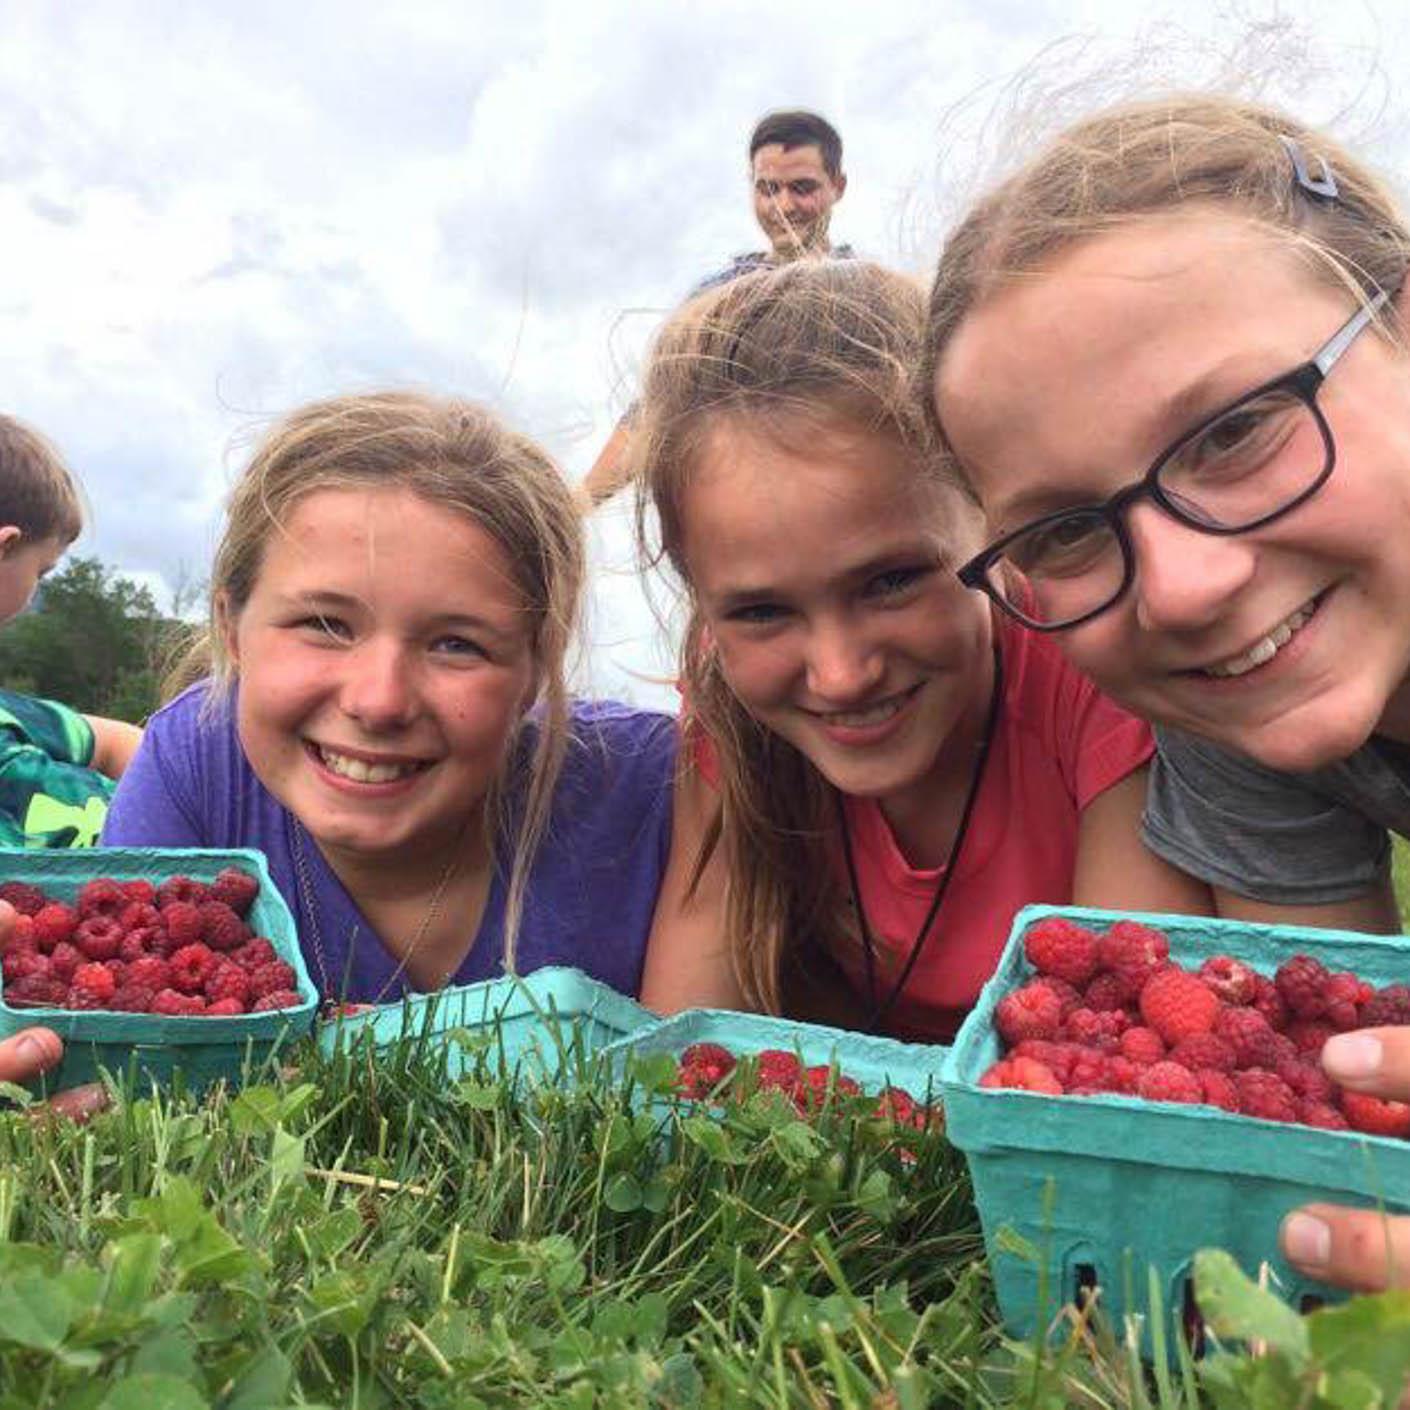 Adirondack Discovery raspberry picking